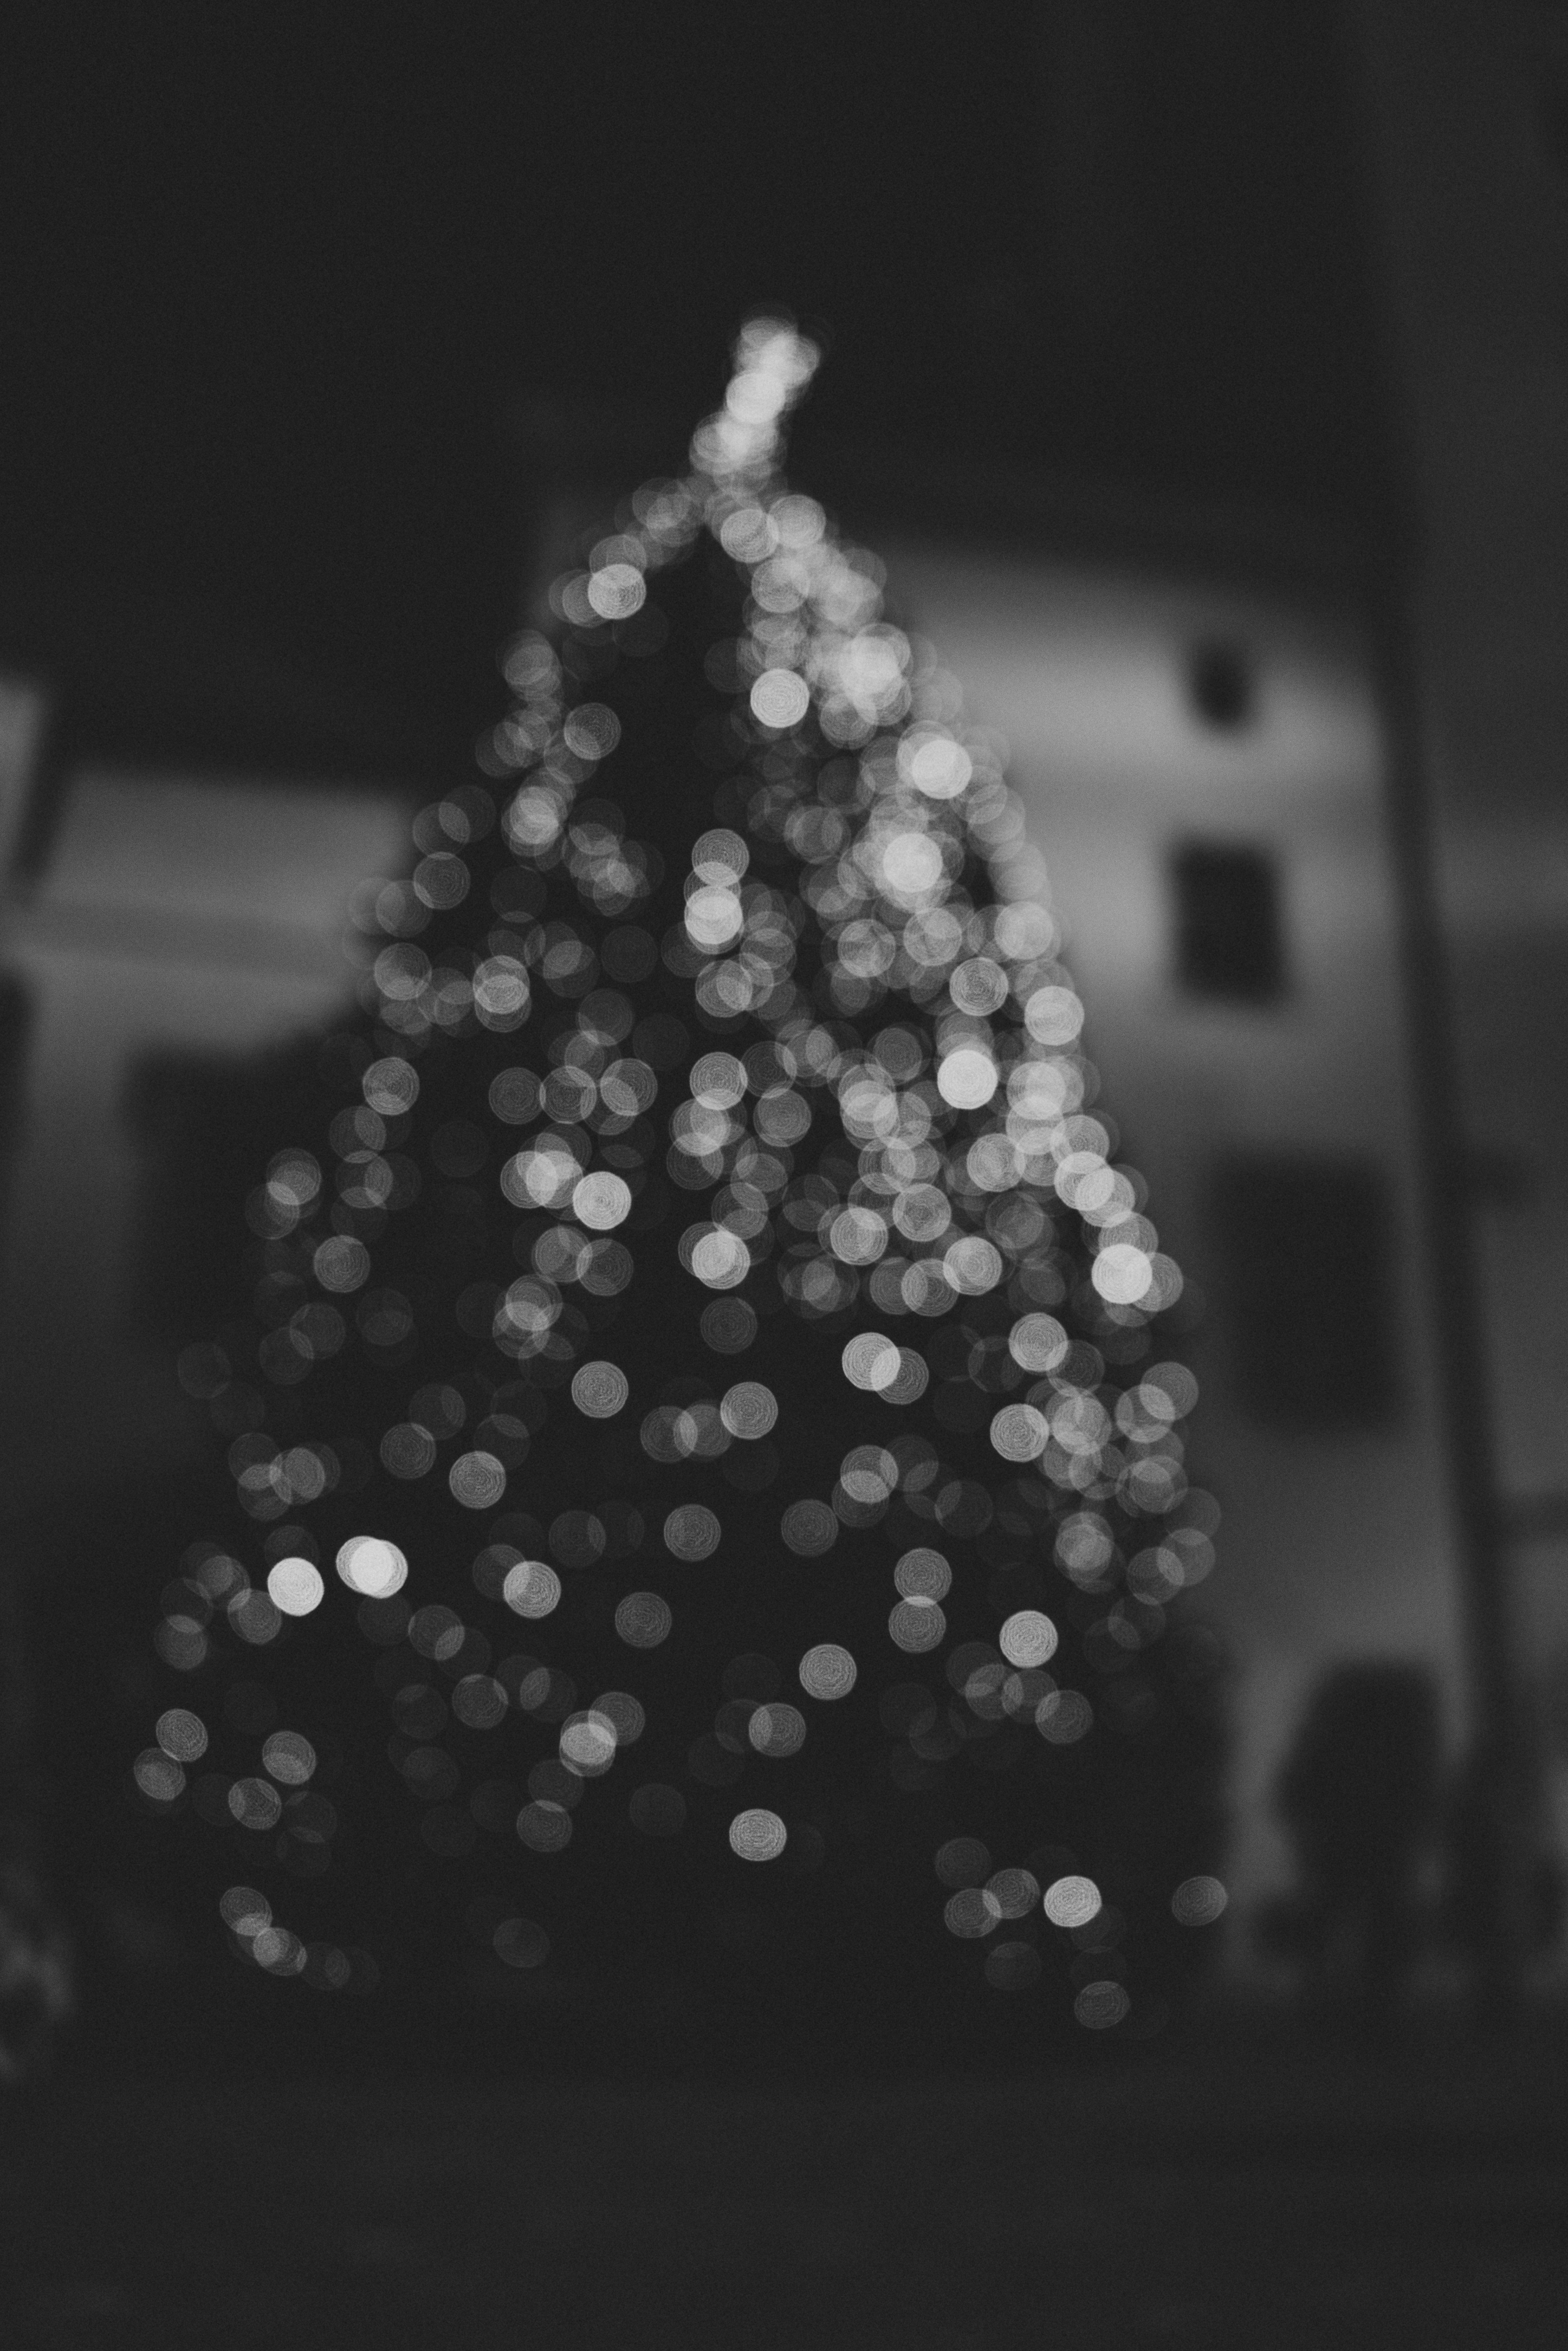 Gambar Pohon Musim Dingin Cahaya Bokeh Hitam Dan Putih Malam Bunga Eropah Kegelapan Satu Warna Hari Natal Penerangan Kedatangan Seni Mono Europa Jerman Kunst Atas Xmas Bentuk Weihnachten Weihnachtsbaum Monochrom Regensburg